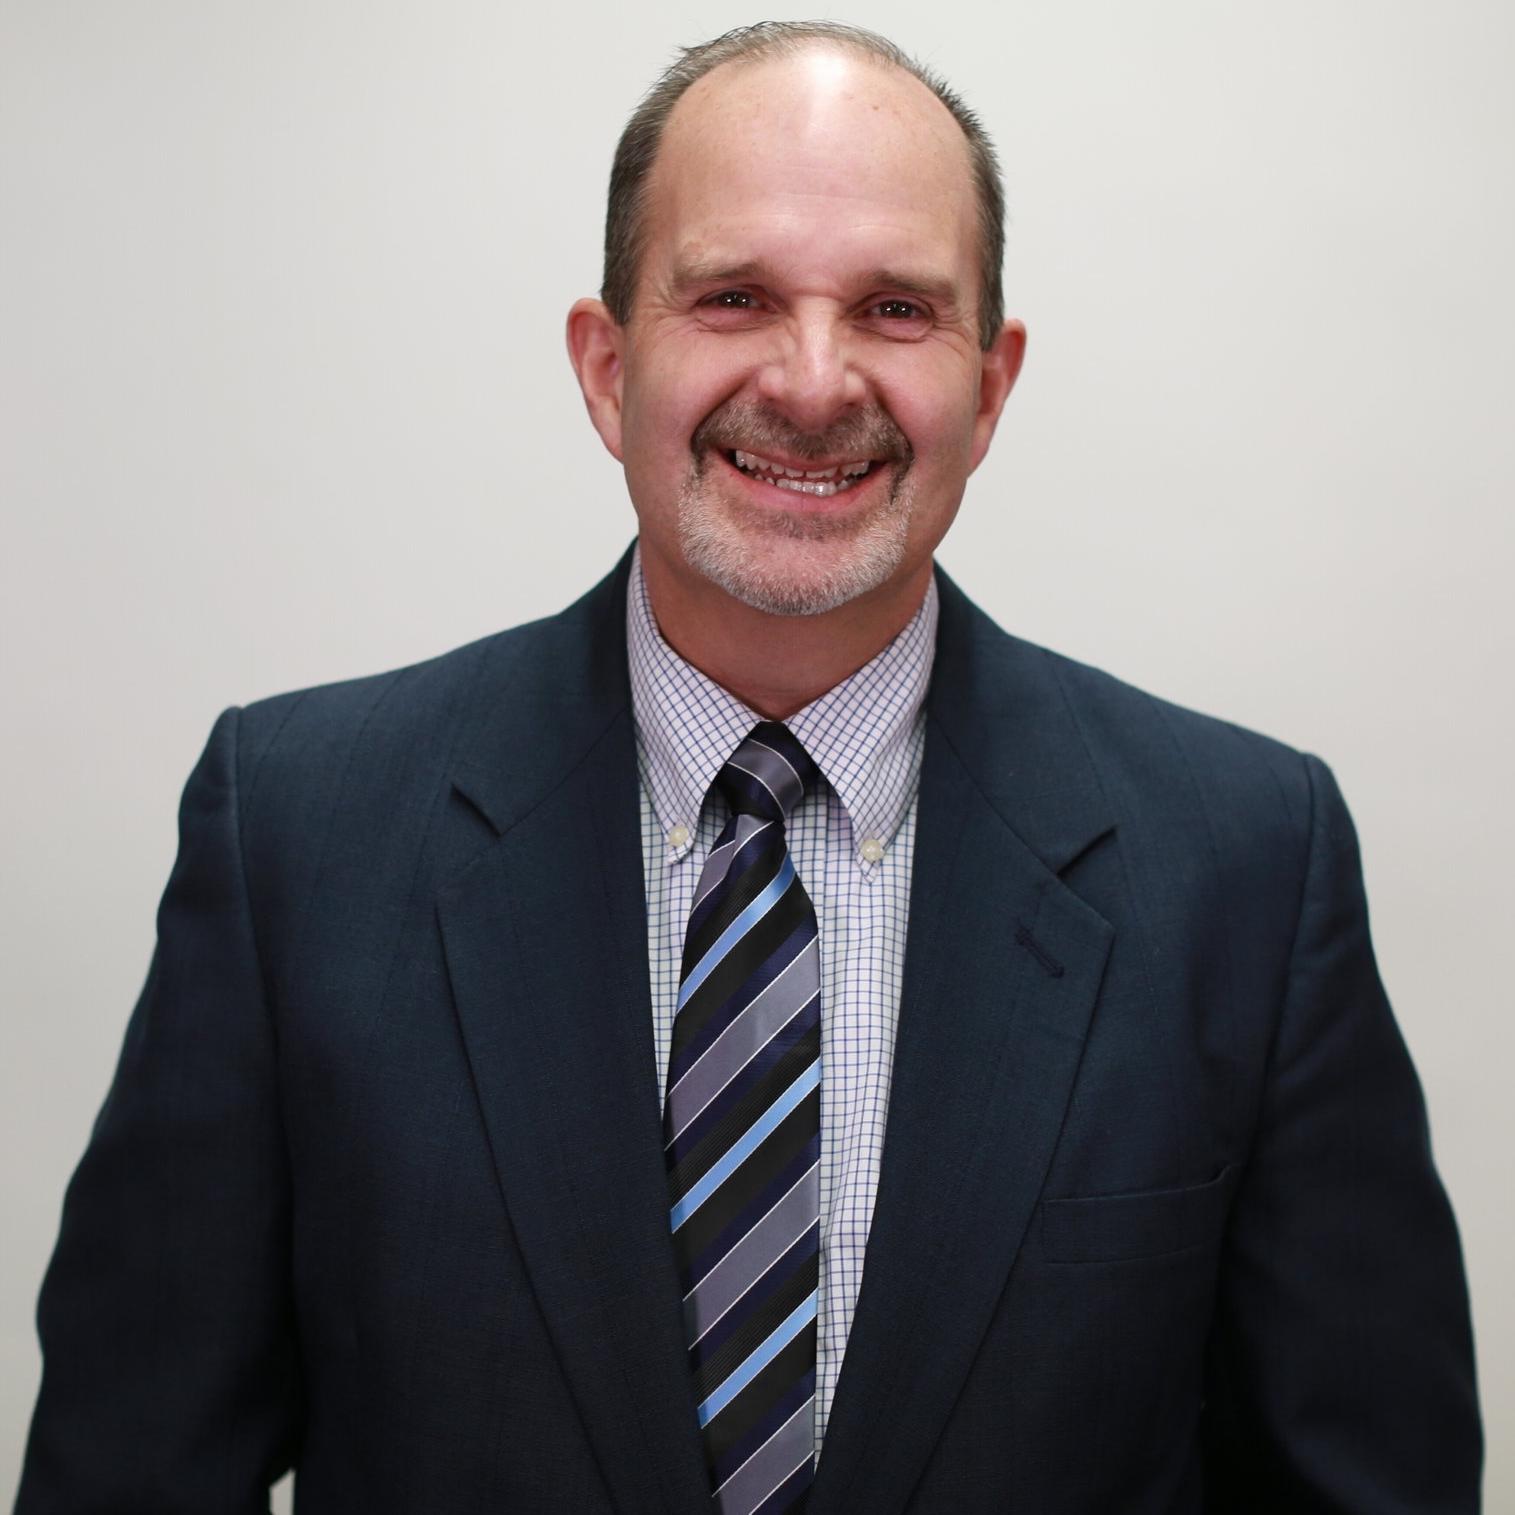 Pastor Richard Austin